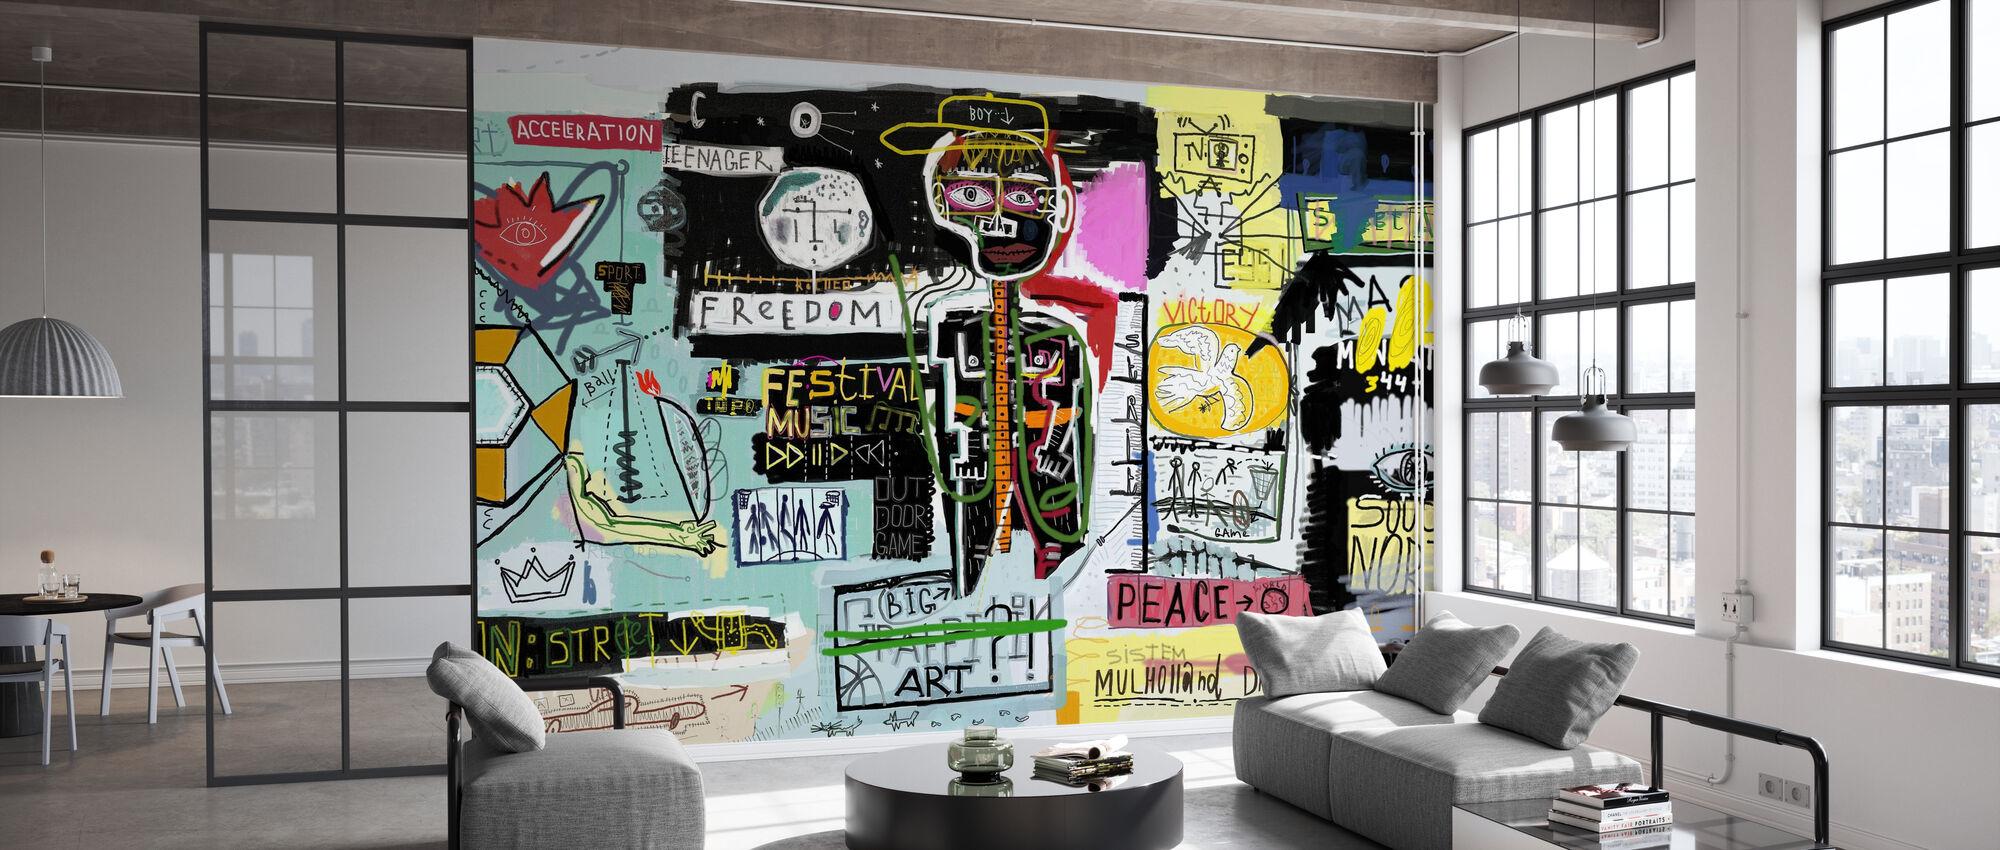 Graffiti Wall - Wallpaper - Office